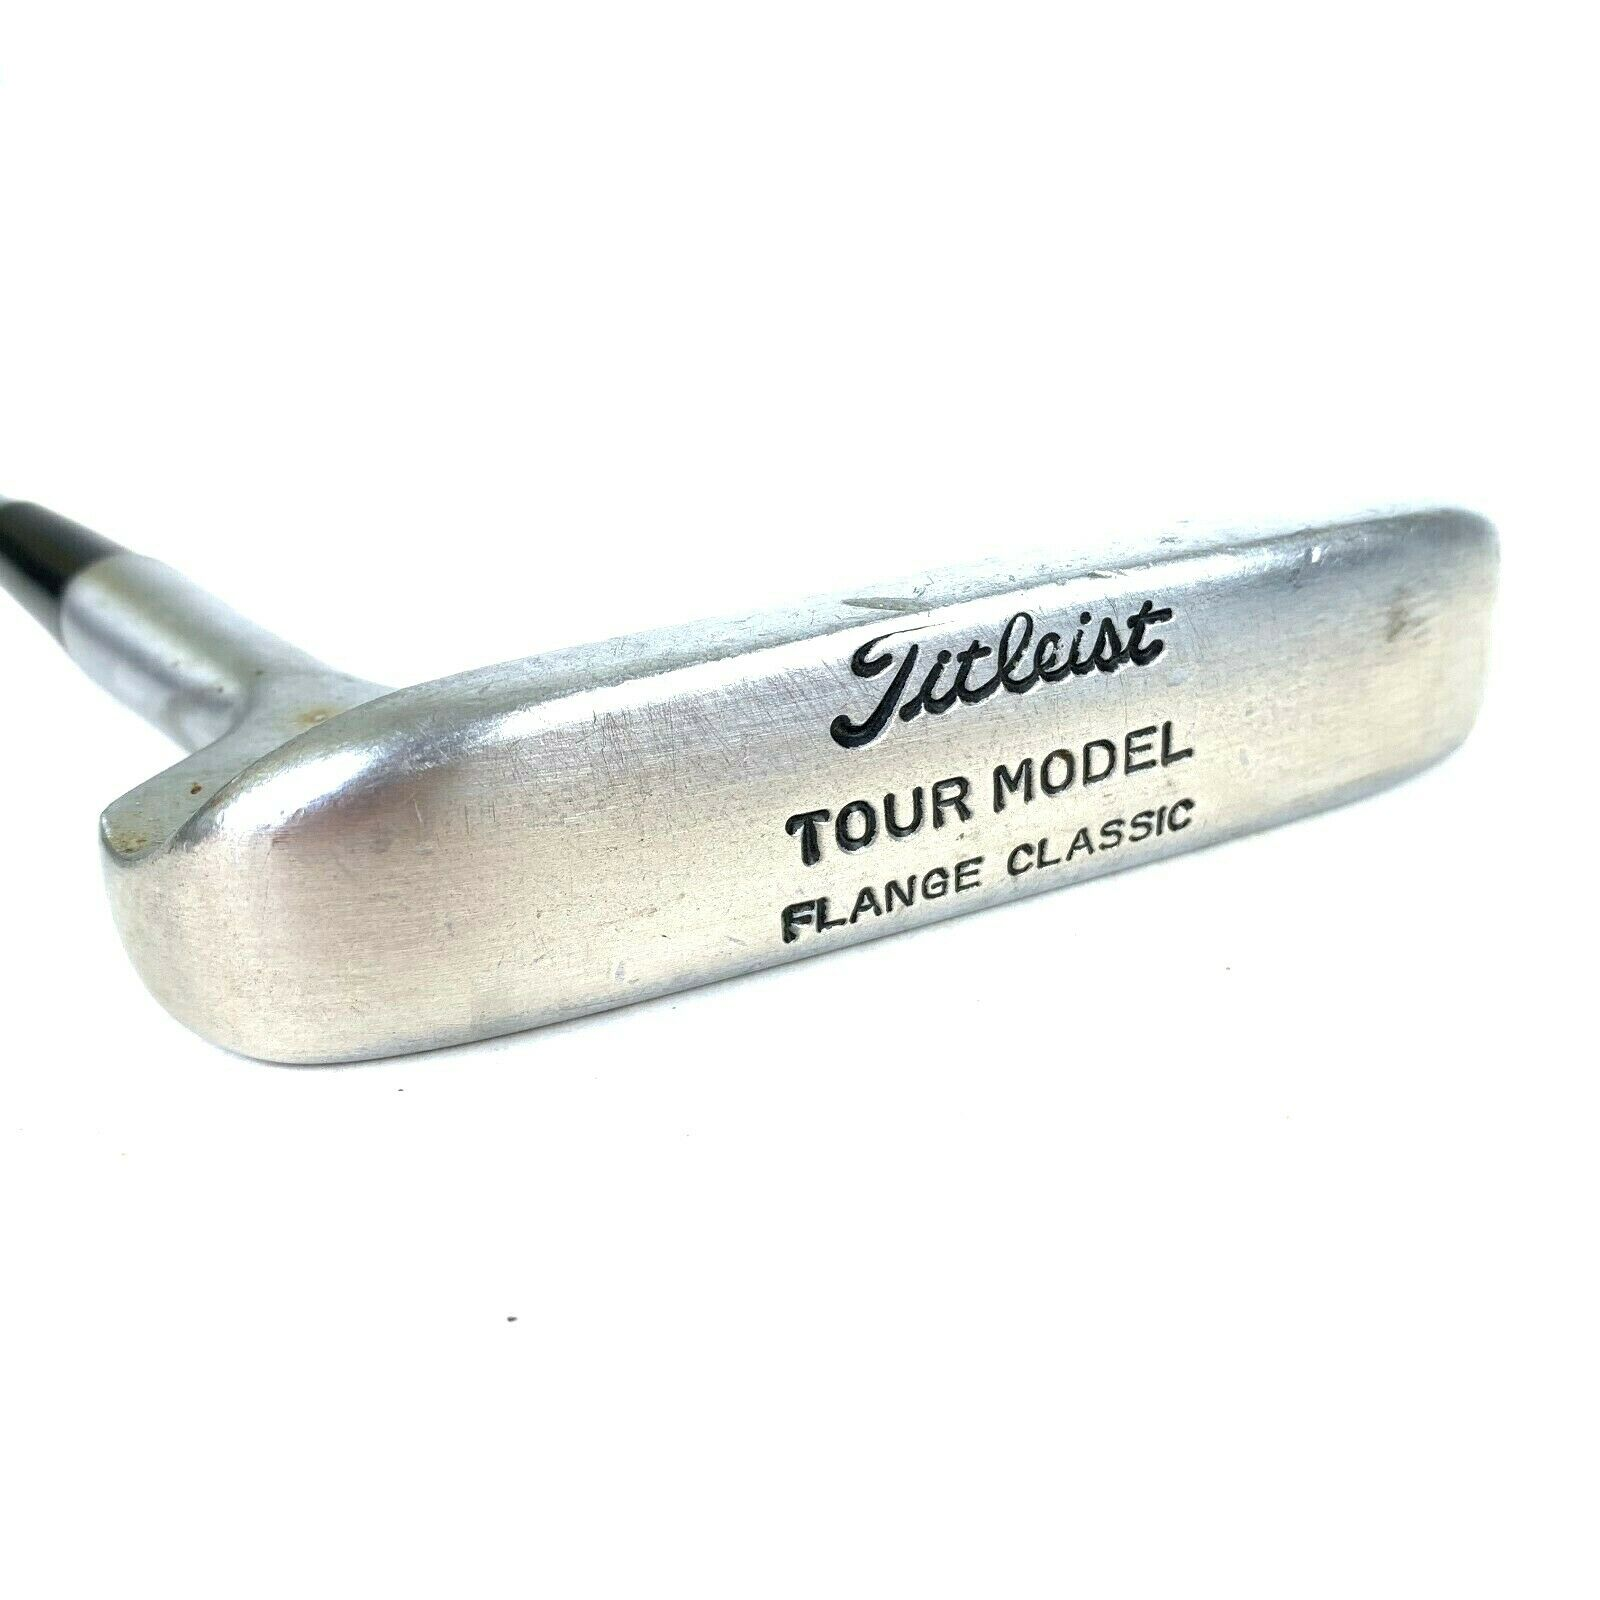 Vintage Titleist Tour Model Brida  Clásico Putter RH 34   precio razonable